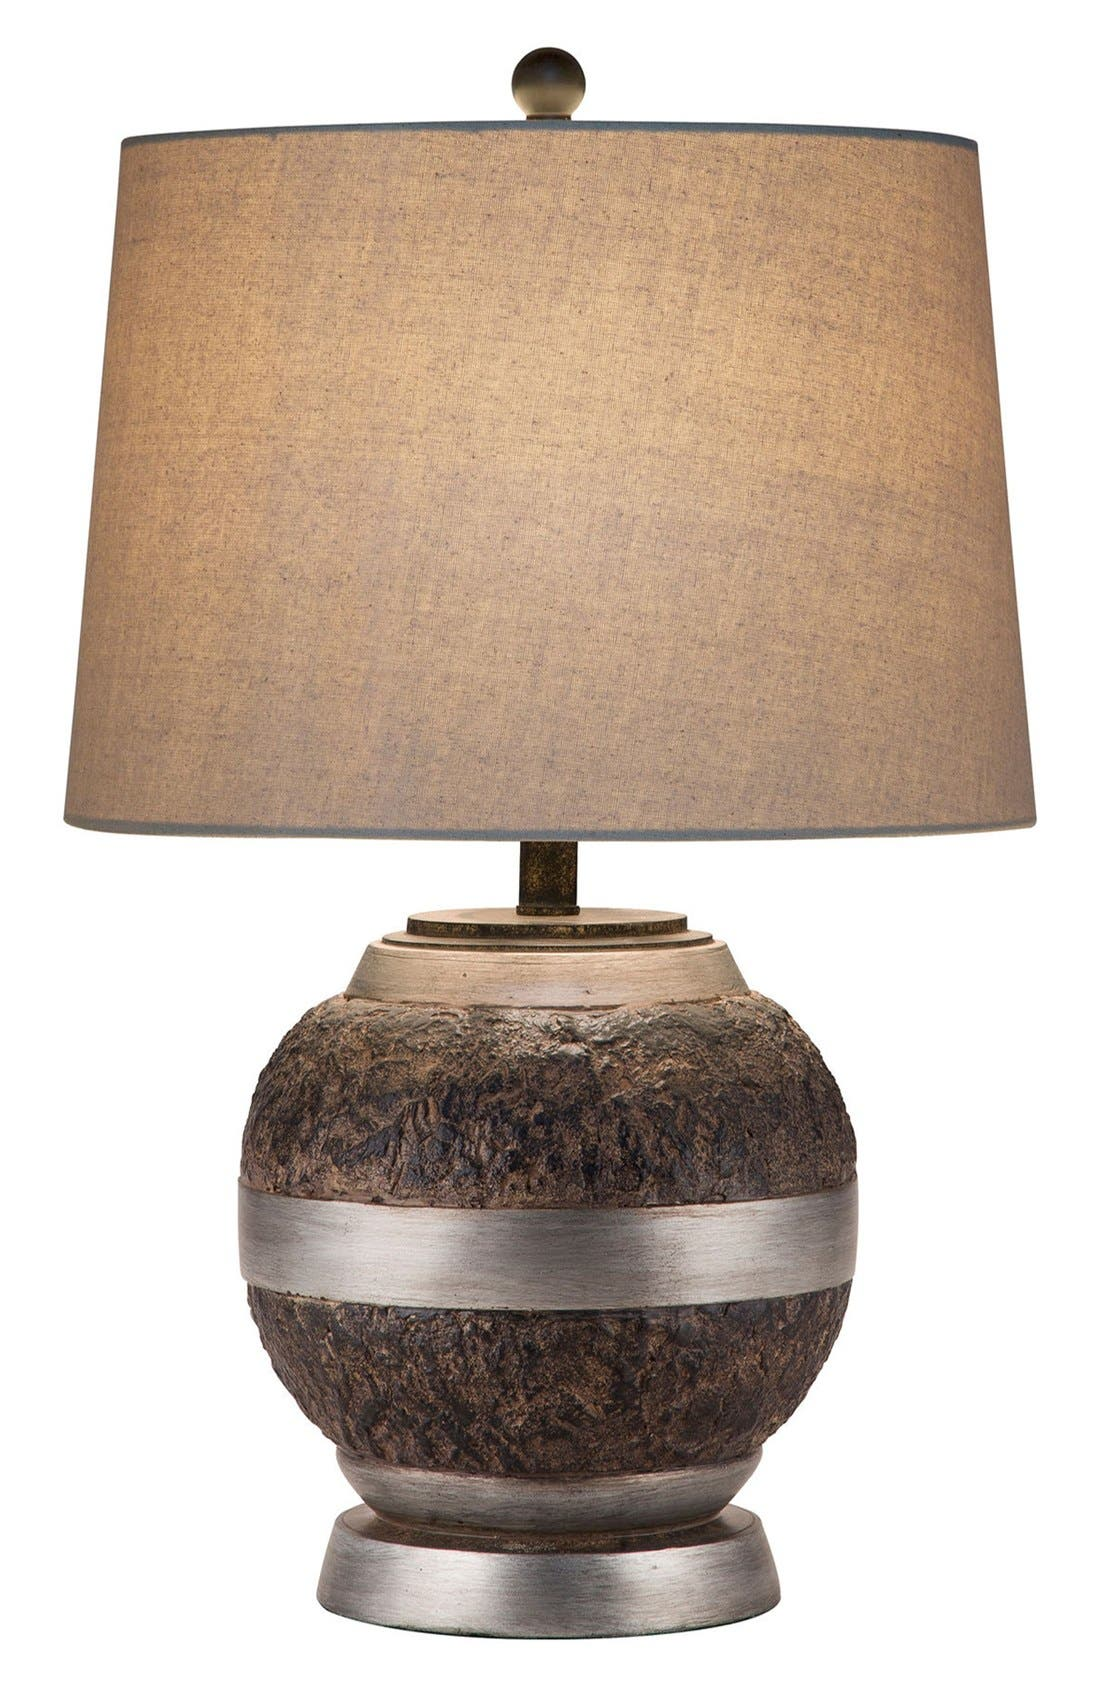 Alternate Image 1 Selected - JAlexander Textured Bronze Finish Table Lamp